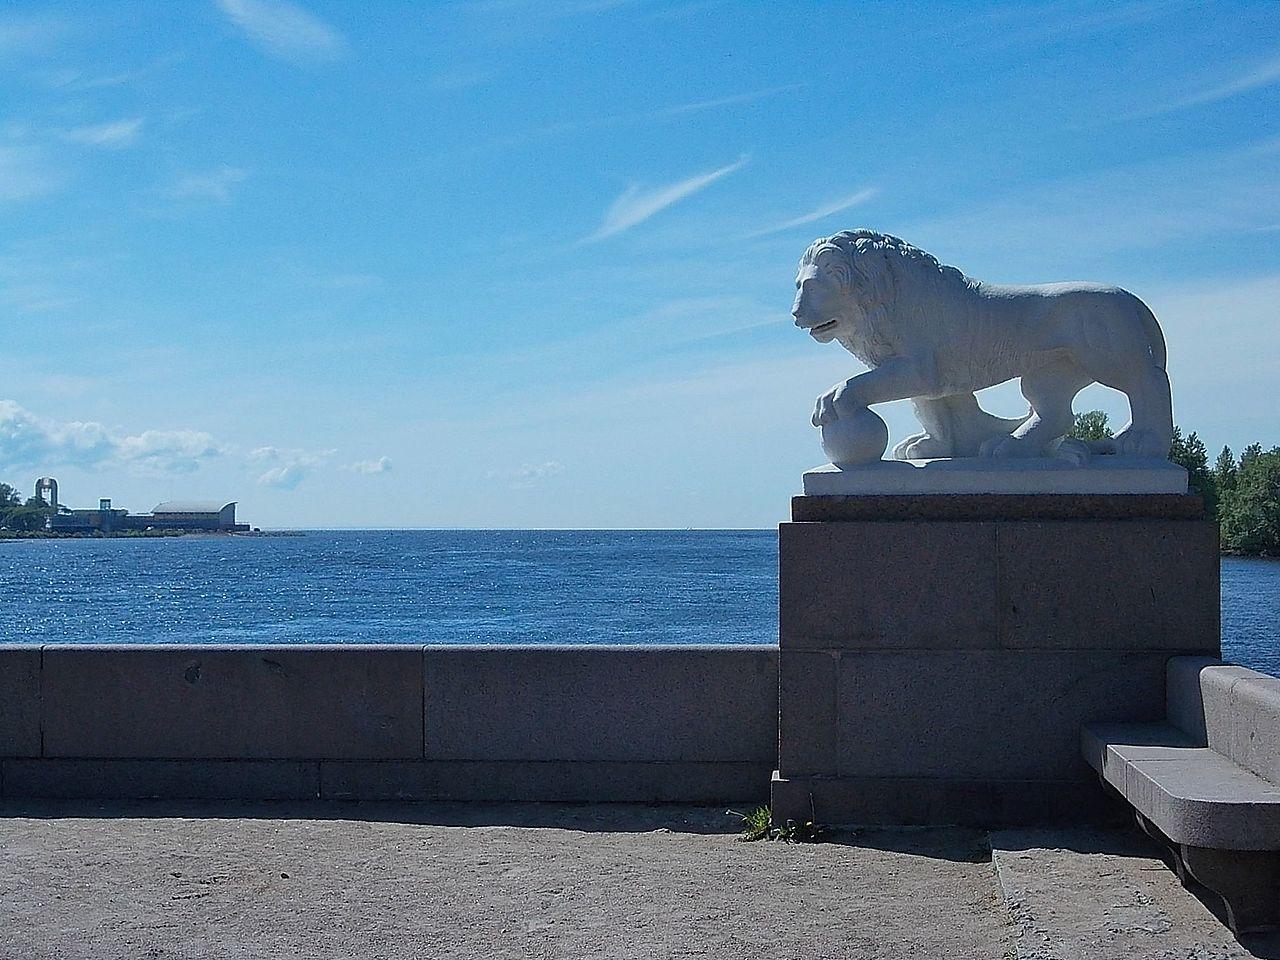 Лев на Западной стрелке Елагина острова. Автор фото: Uz1awa (Wikimedia Commons)